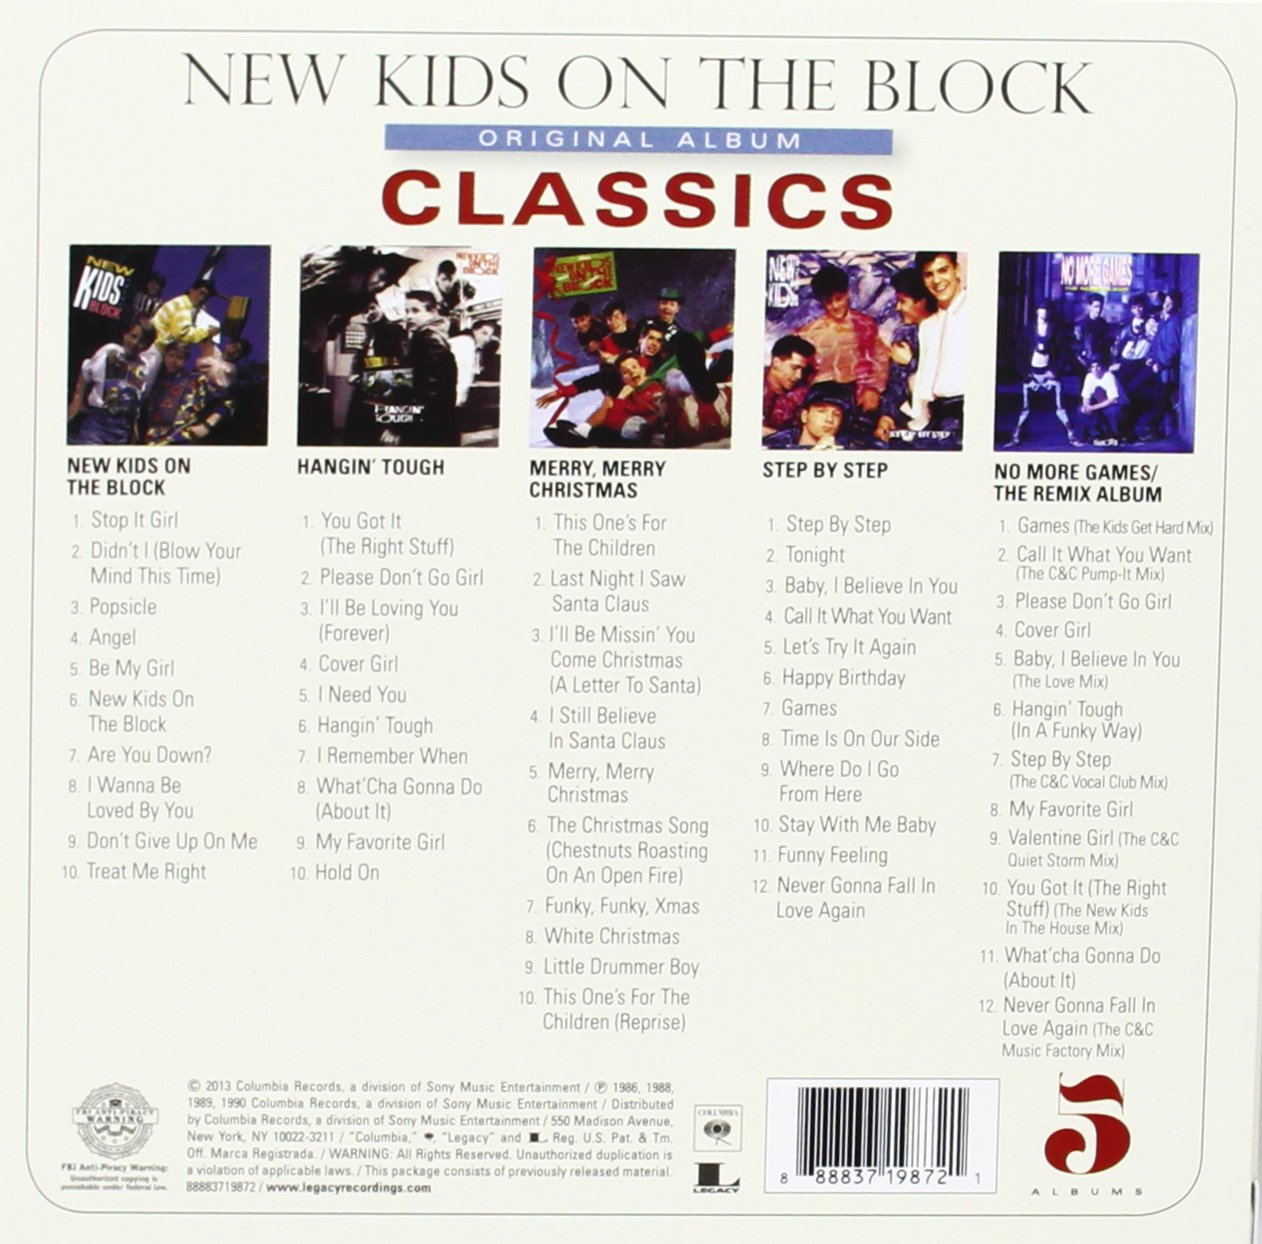 New Kids On The Block Original Album Classics Amazoncom Music